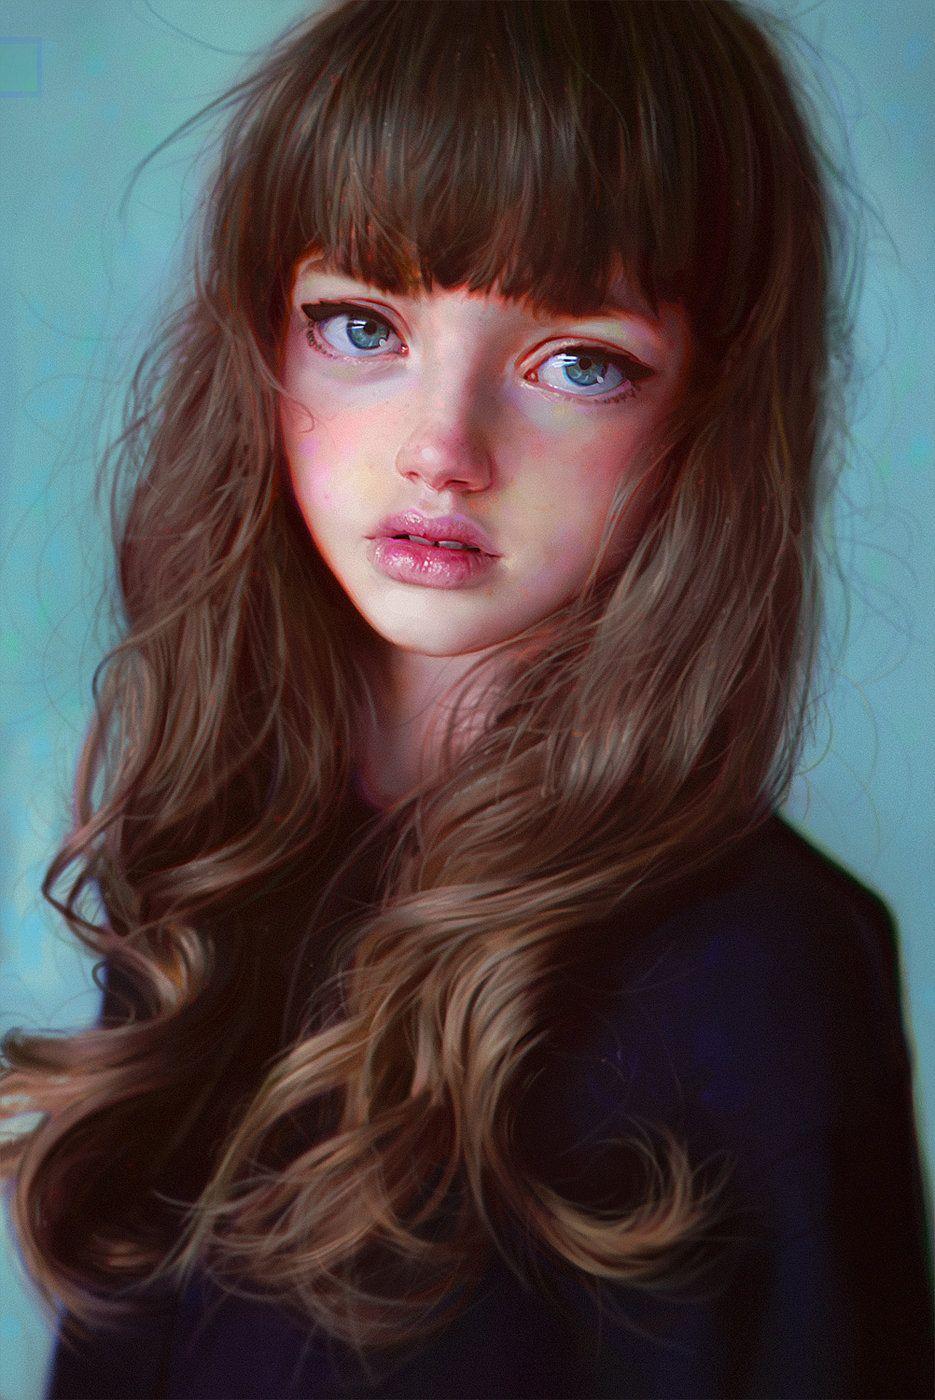 بالصور رسومات بنات جميلة , رسومات للبنات جميلة و روعة 3844 5